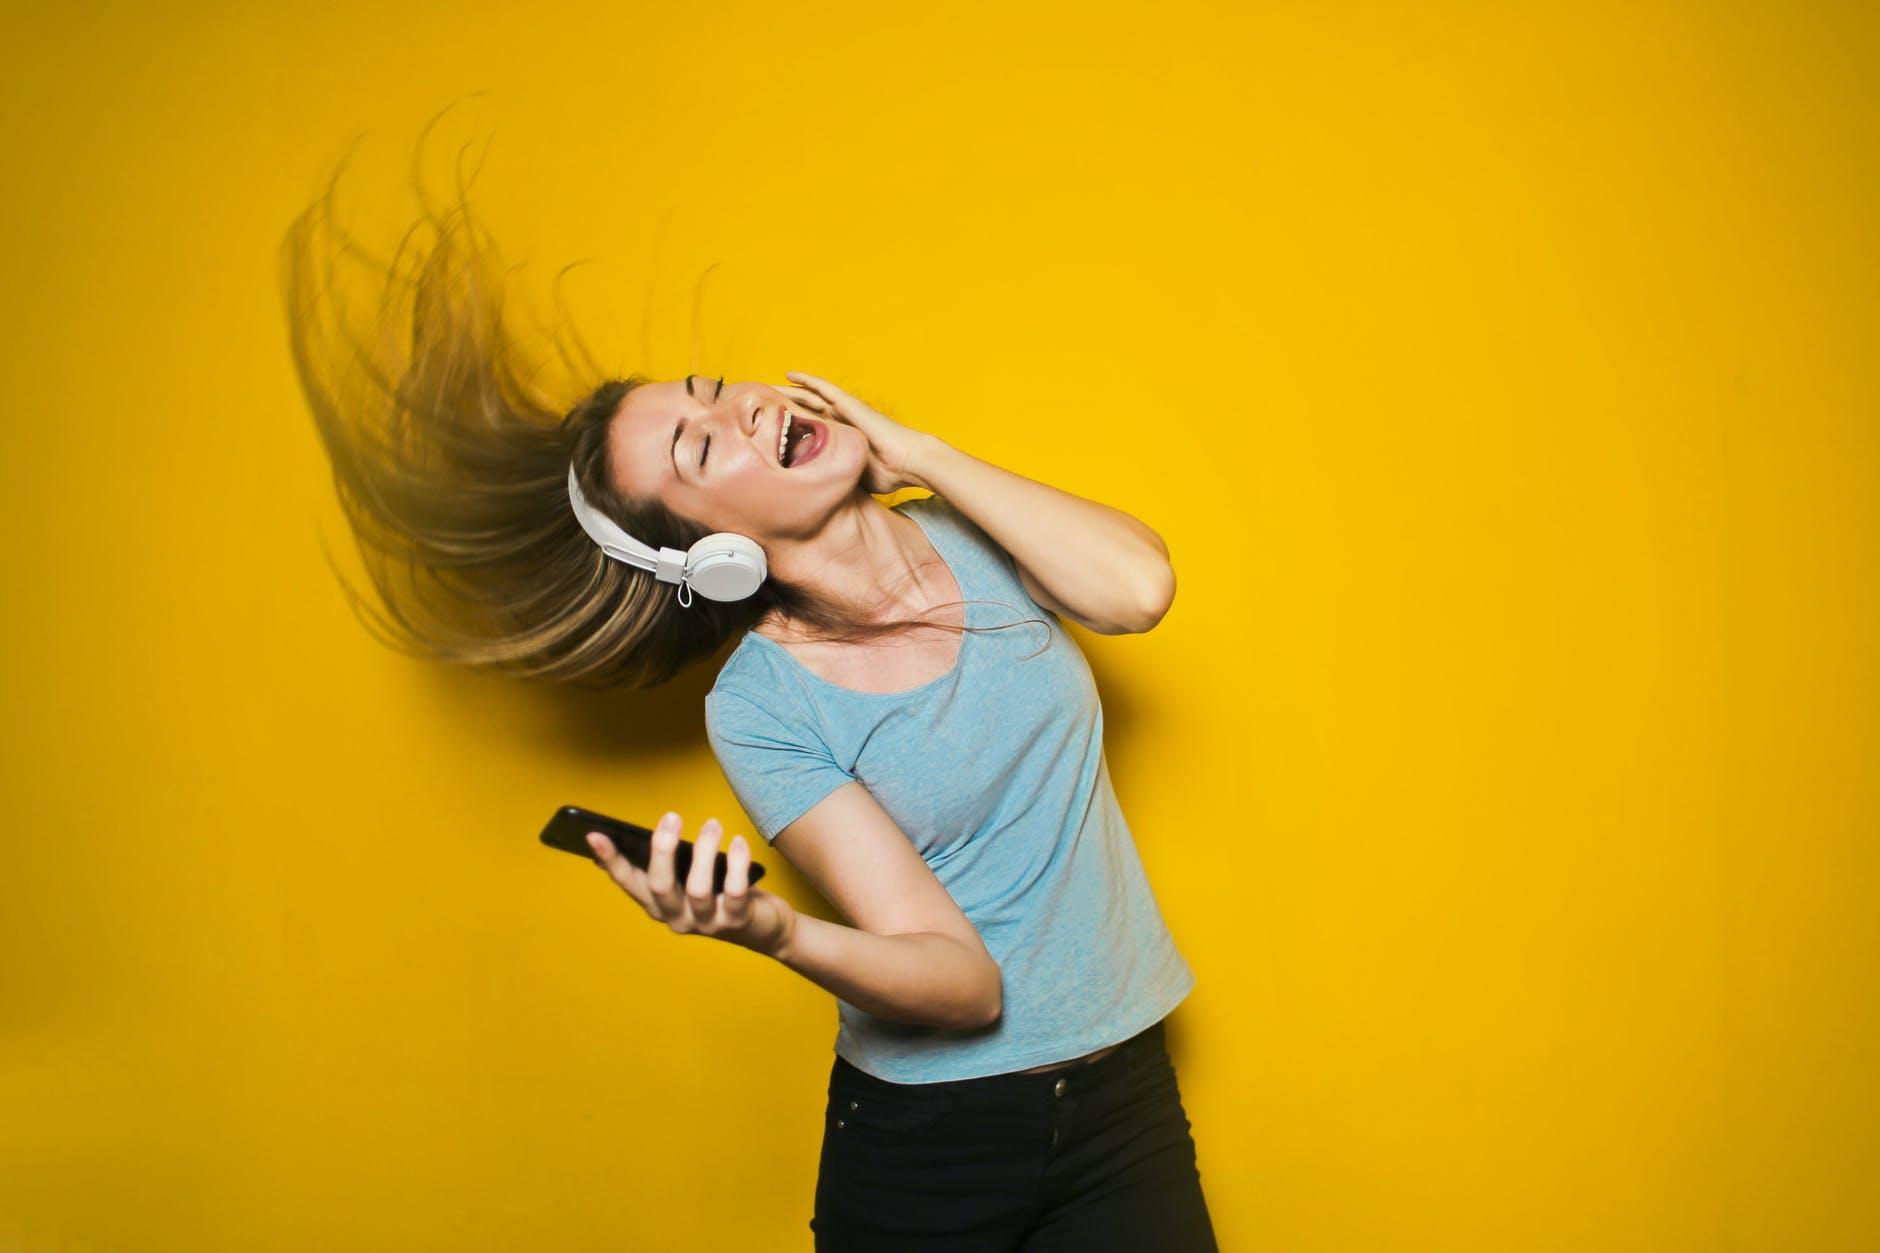 Best Wireless Headphones for Running